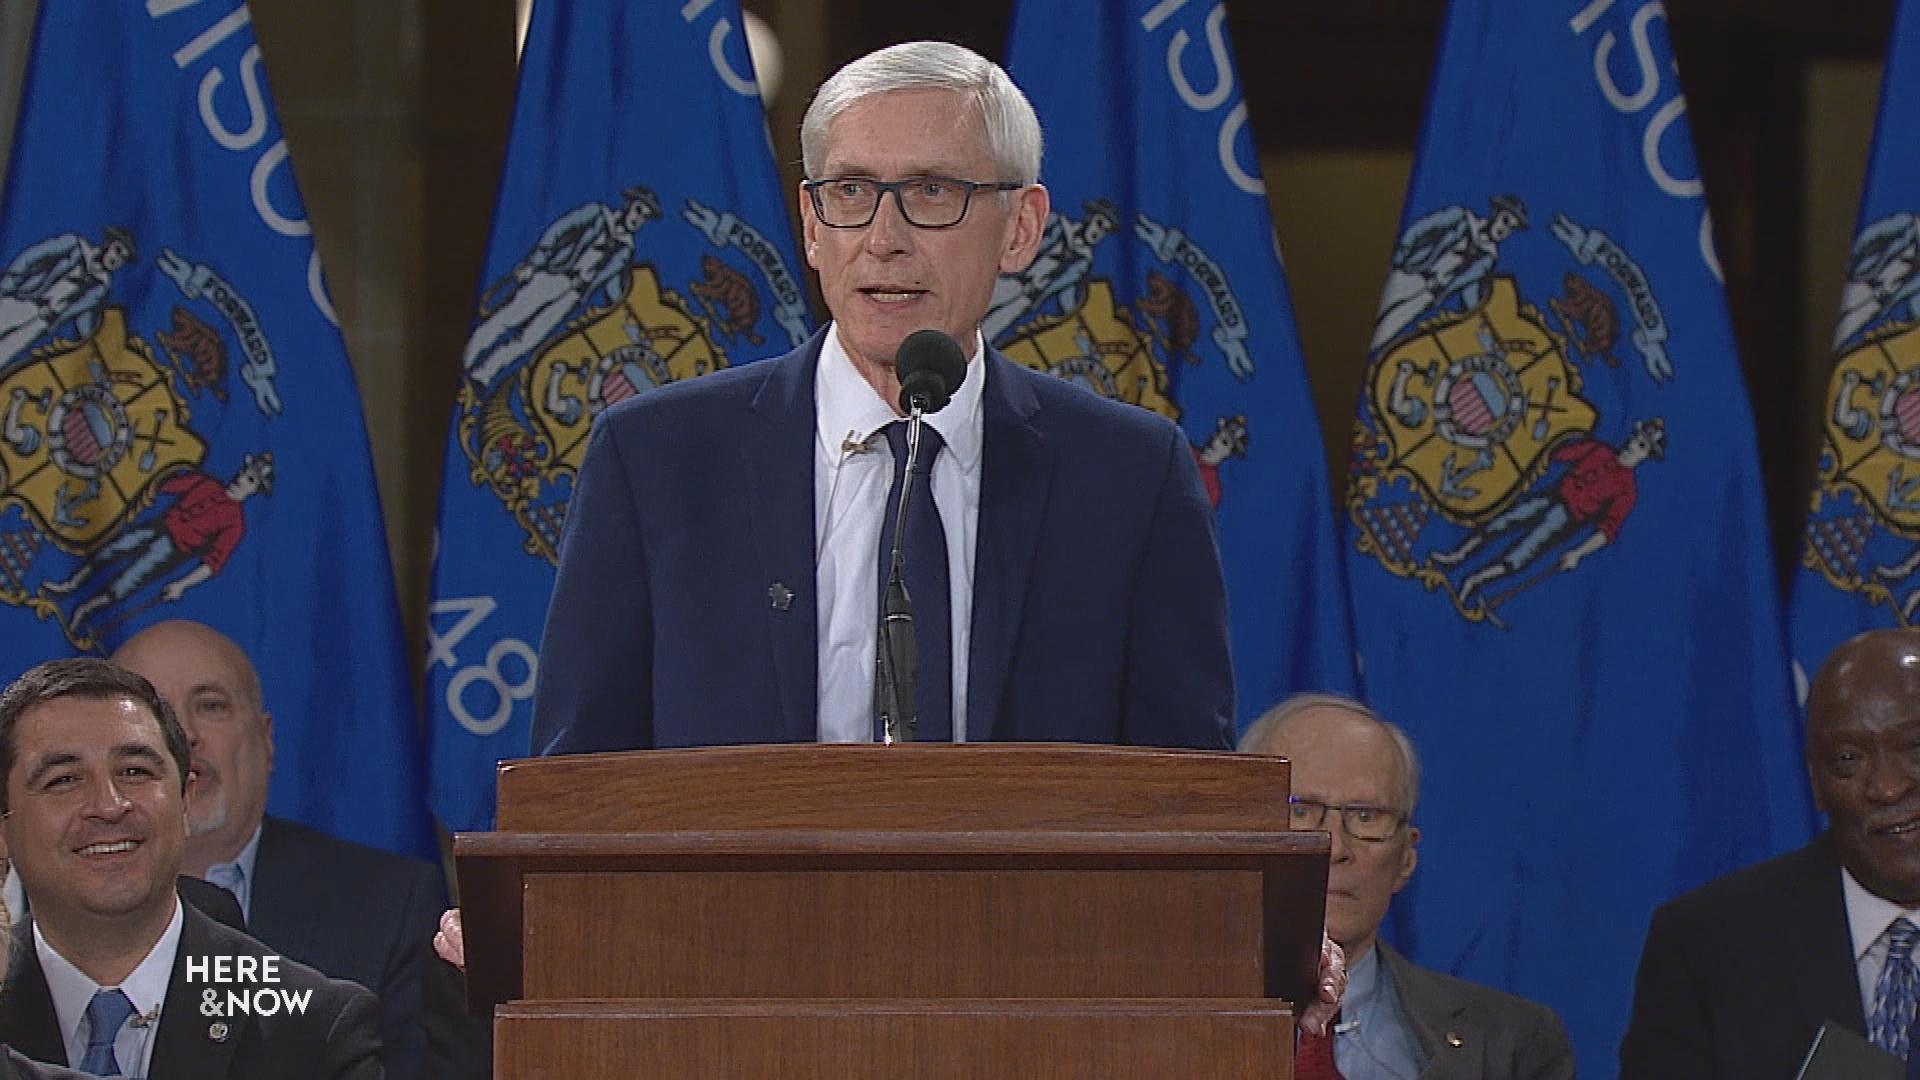 New Administration, New Legislature Sworn In at Capitol